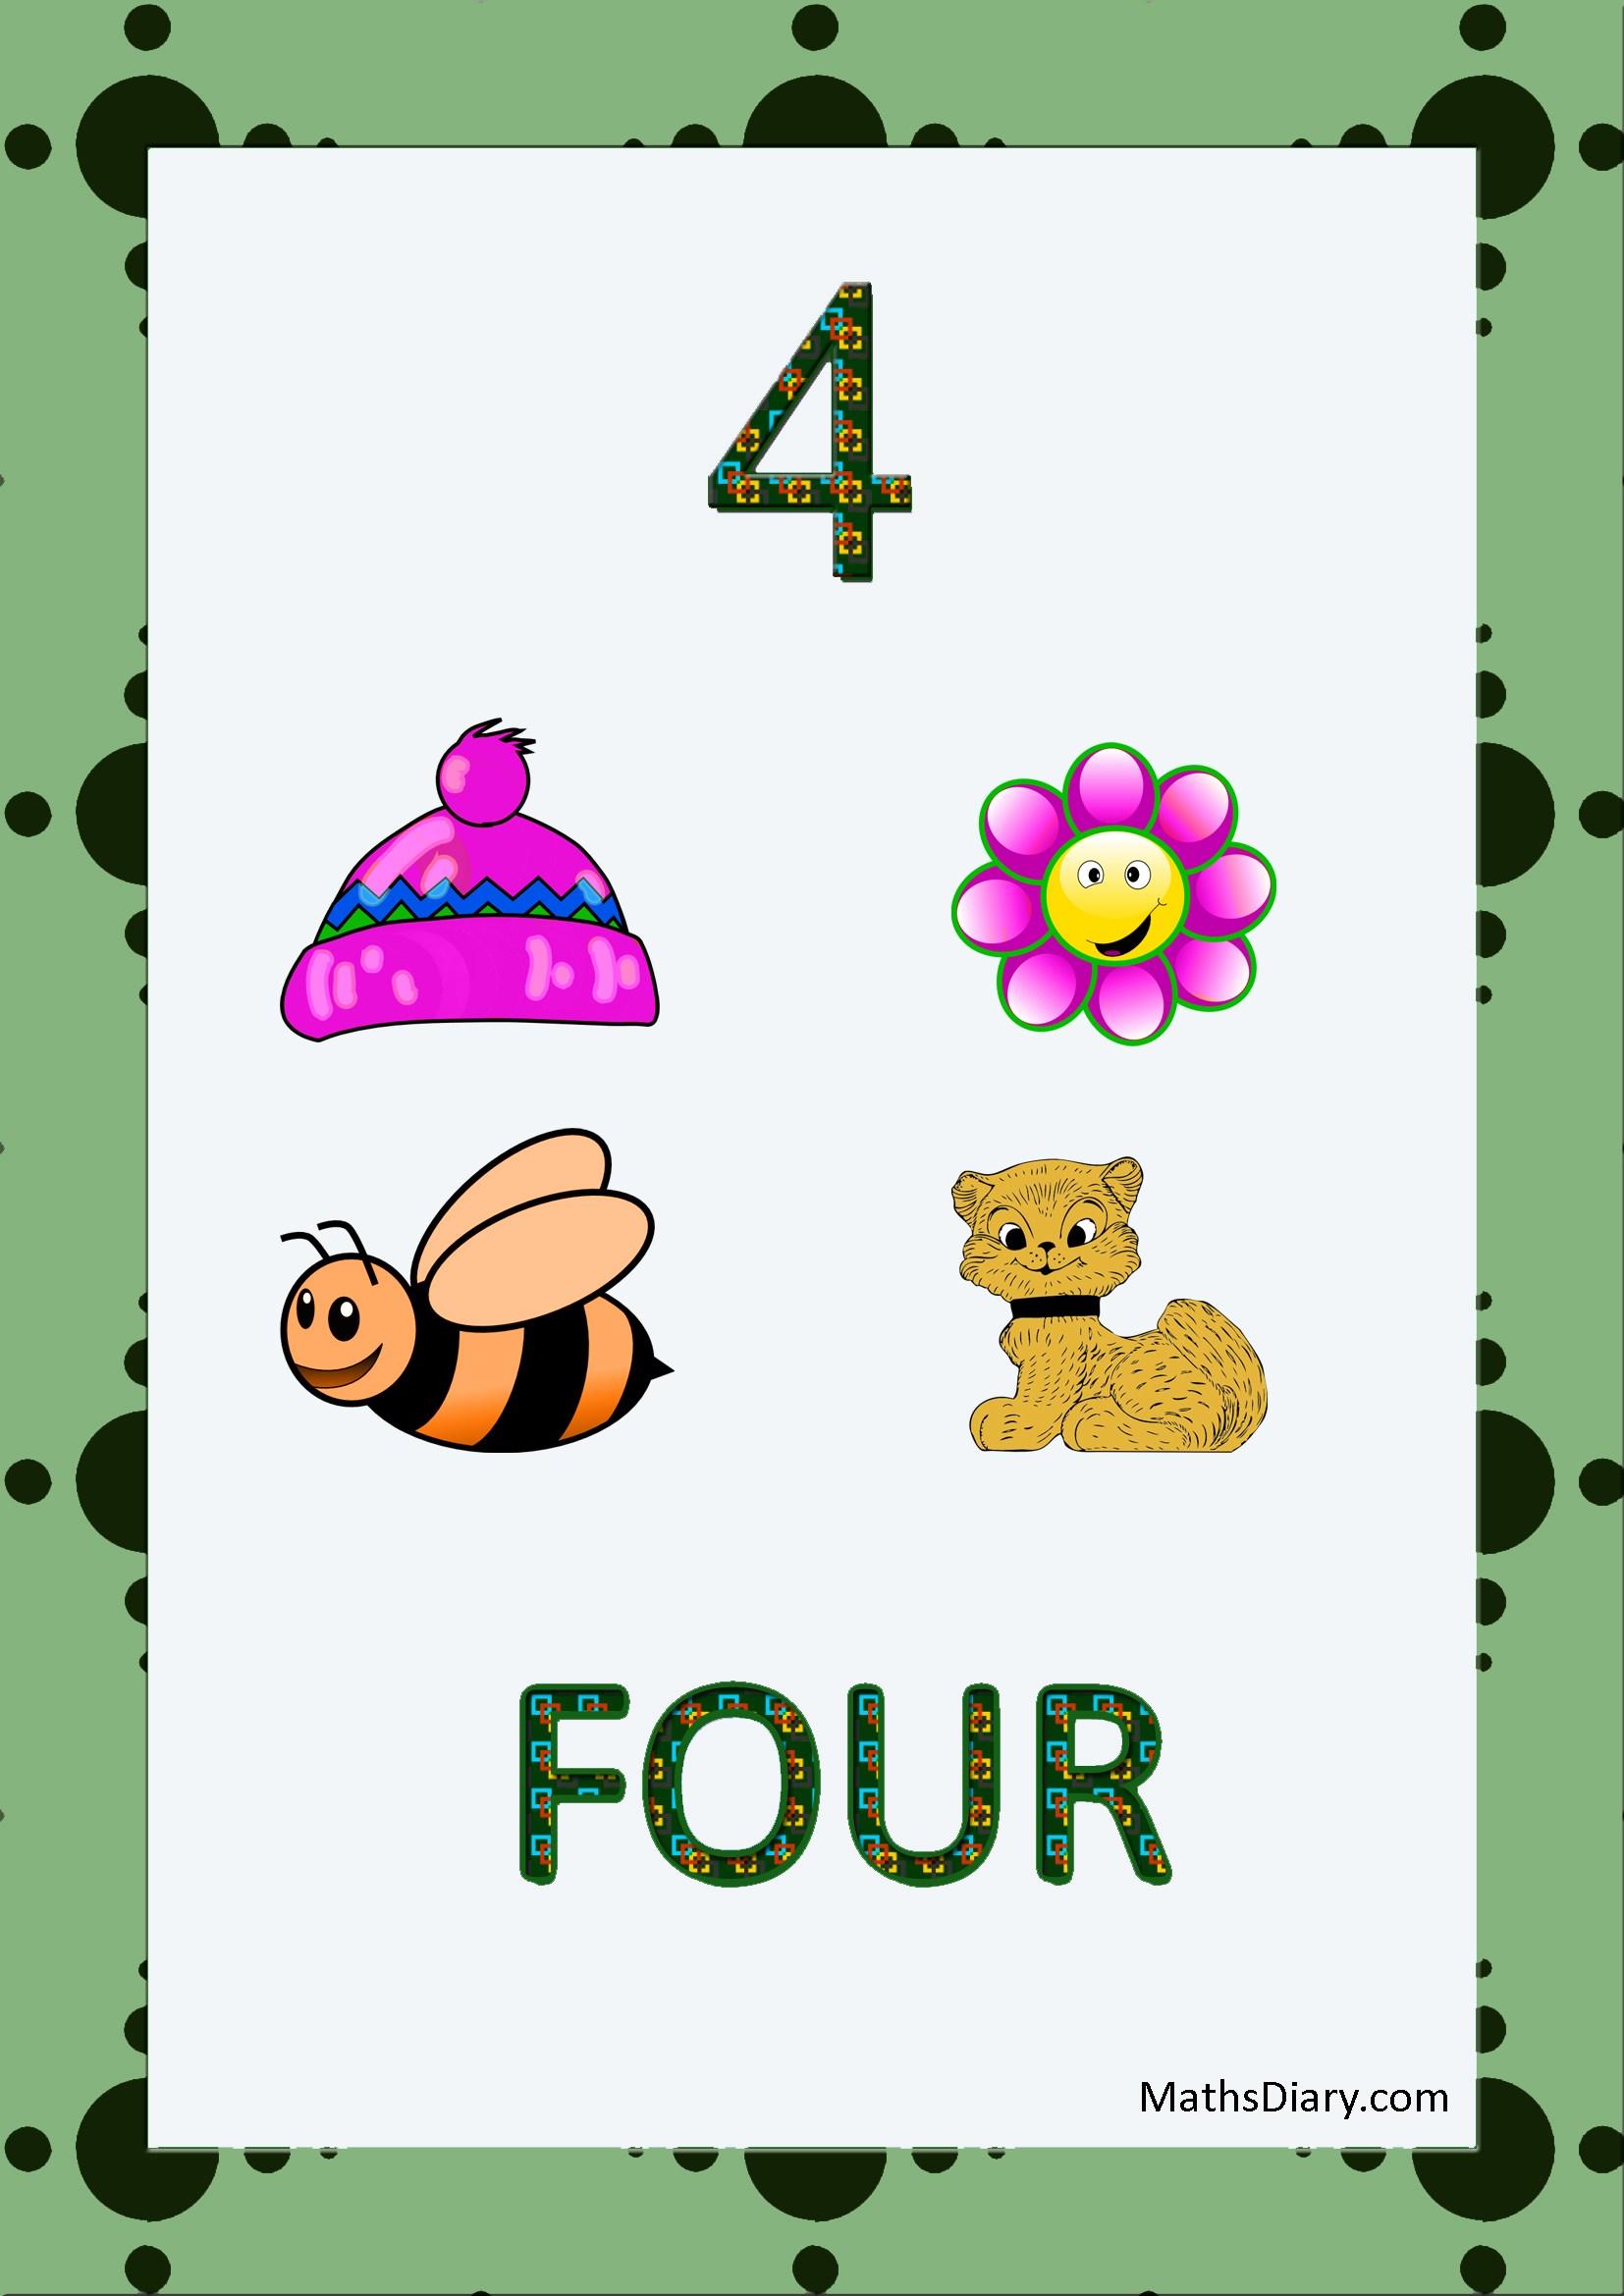 Counting Ukg Math Worksheets